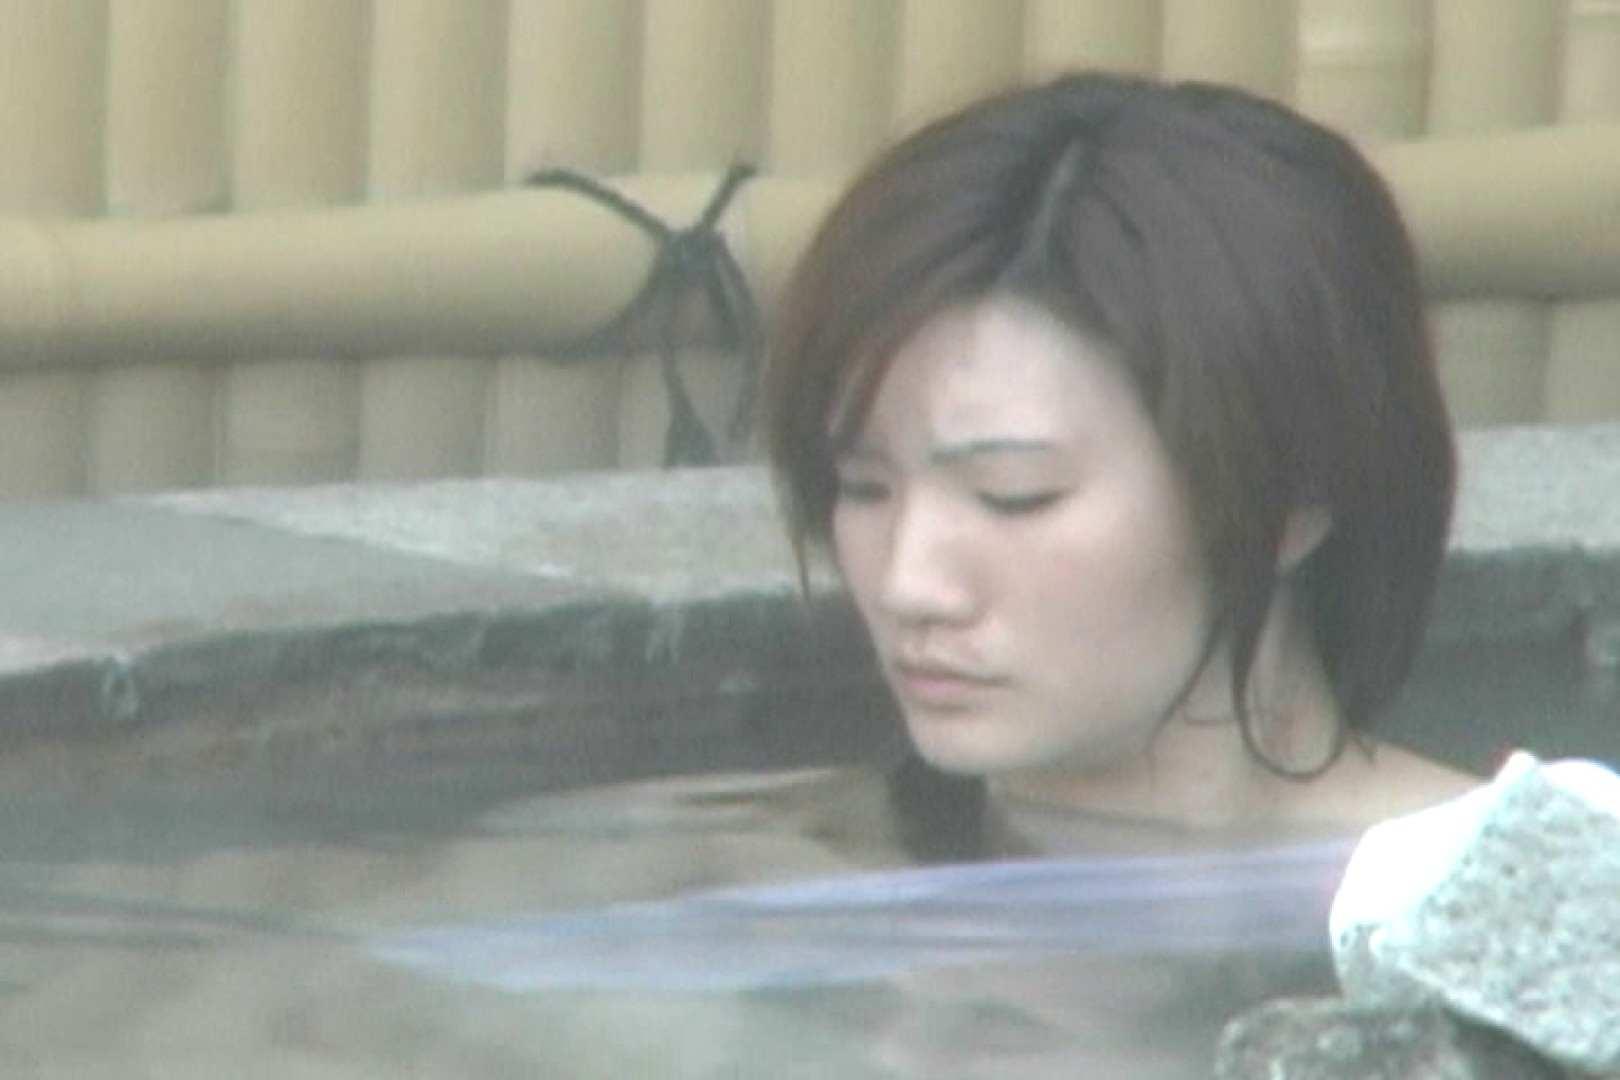 Aquaな露天風呂Vol.590 露天 AV無料 112pic 64